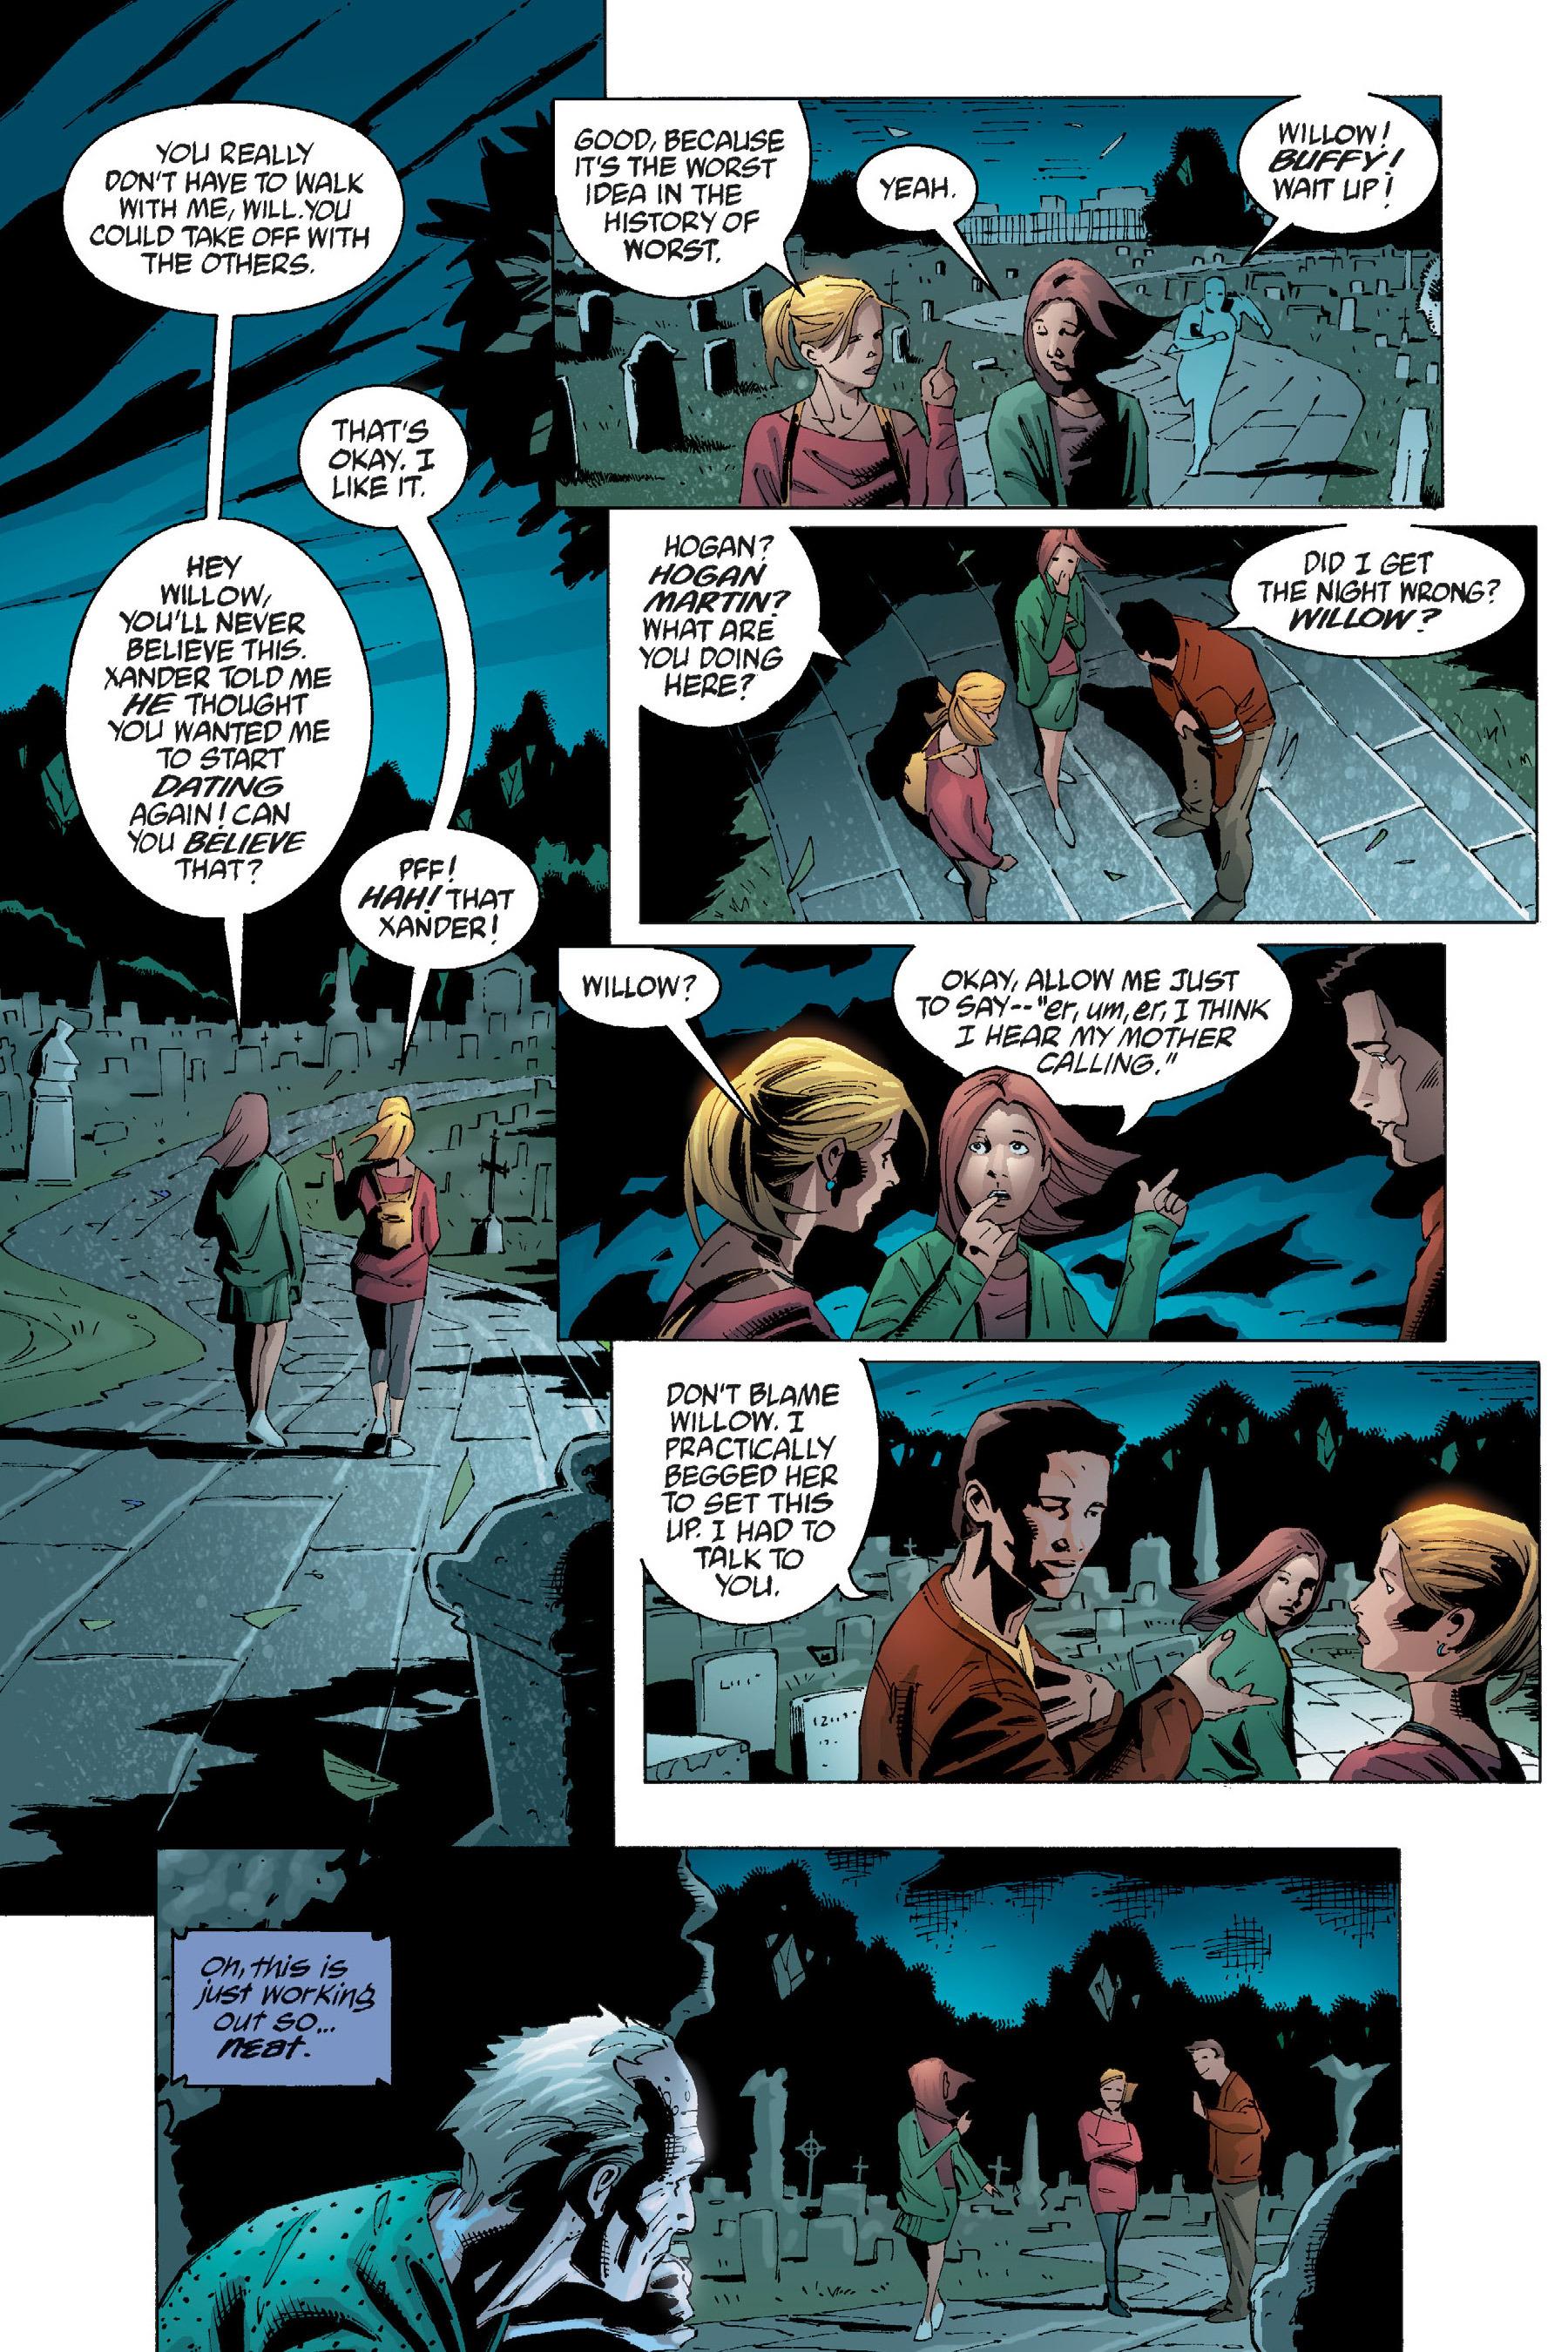 Read online Buffy the Vampire Slayer: Omnibus comic -  Issue # TPB 5 - 25